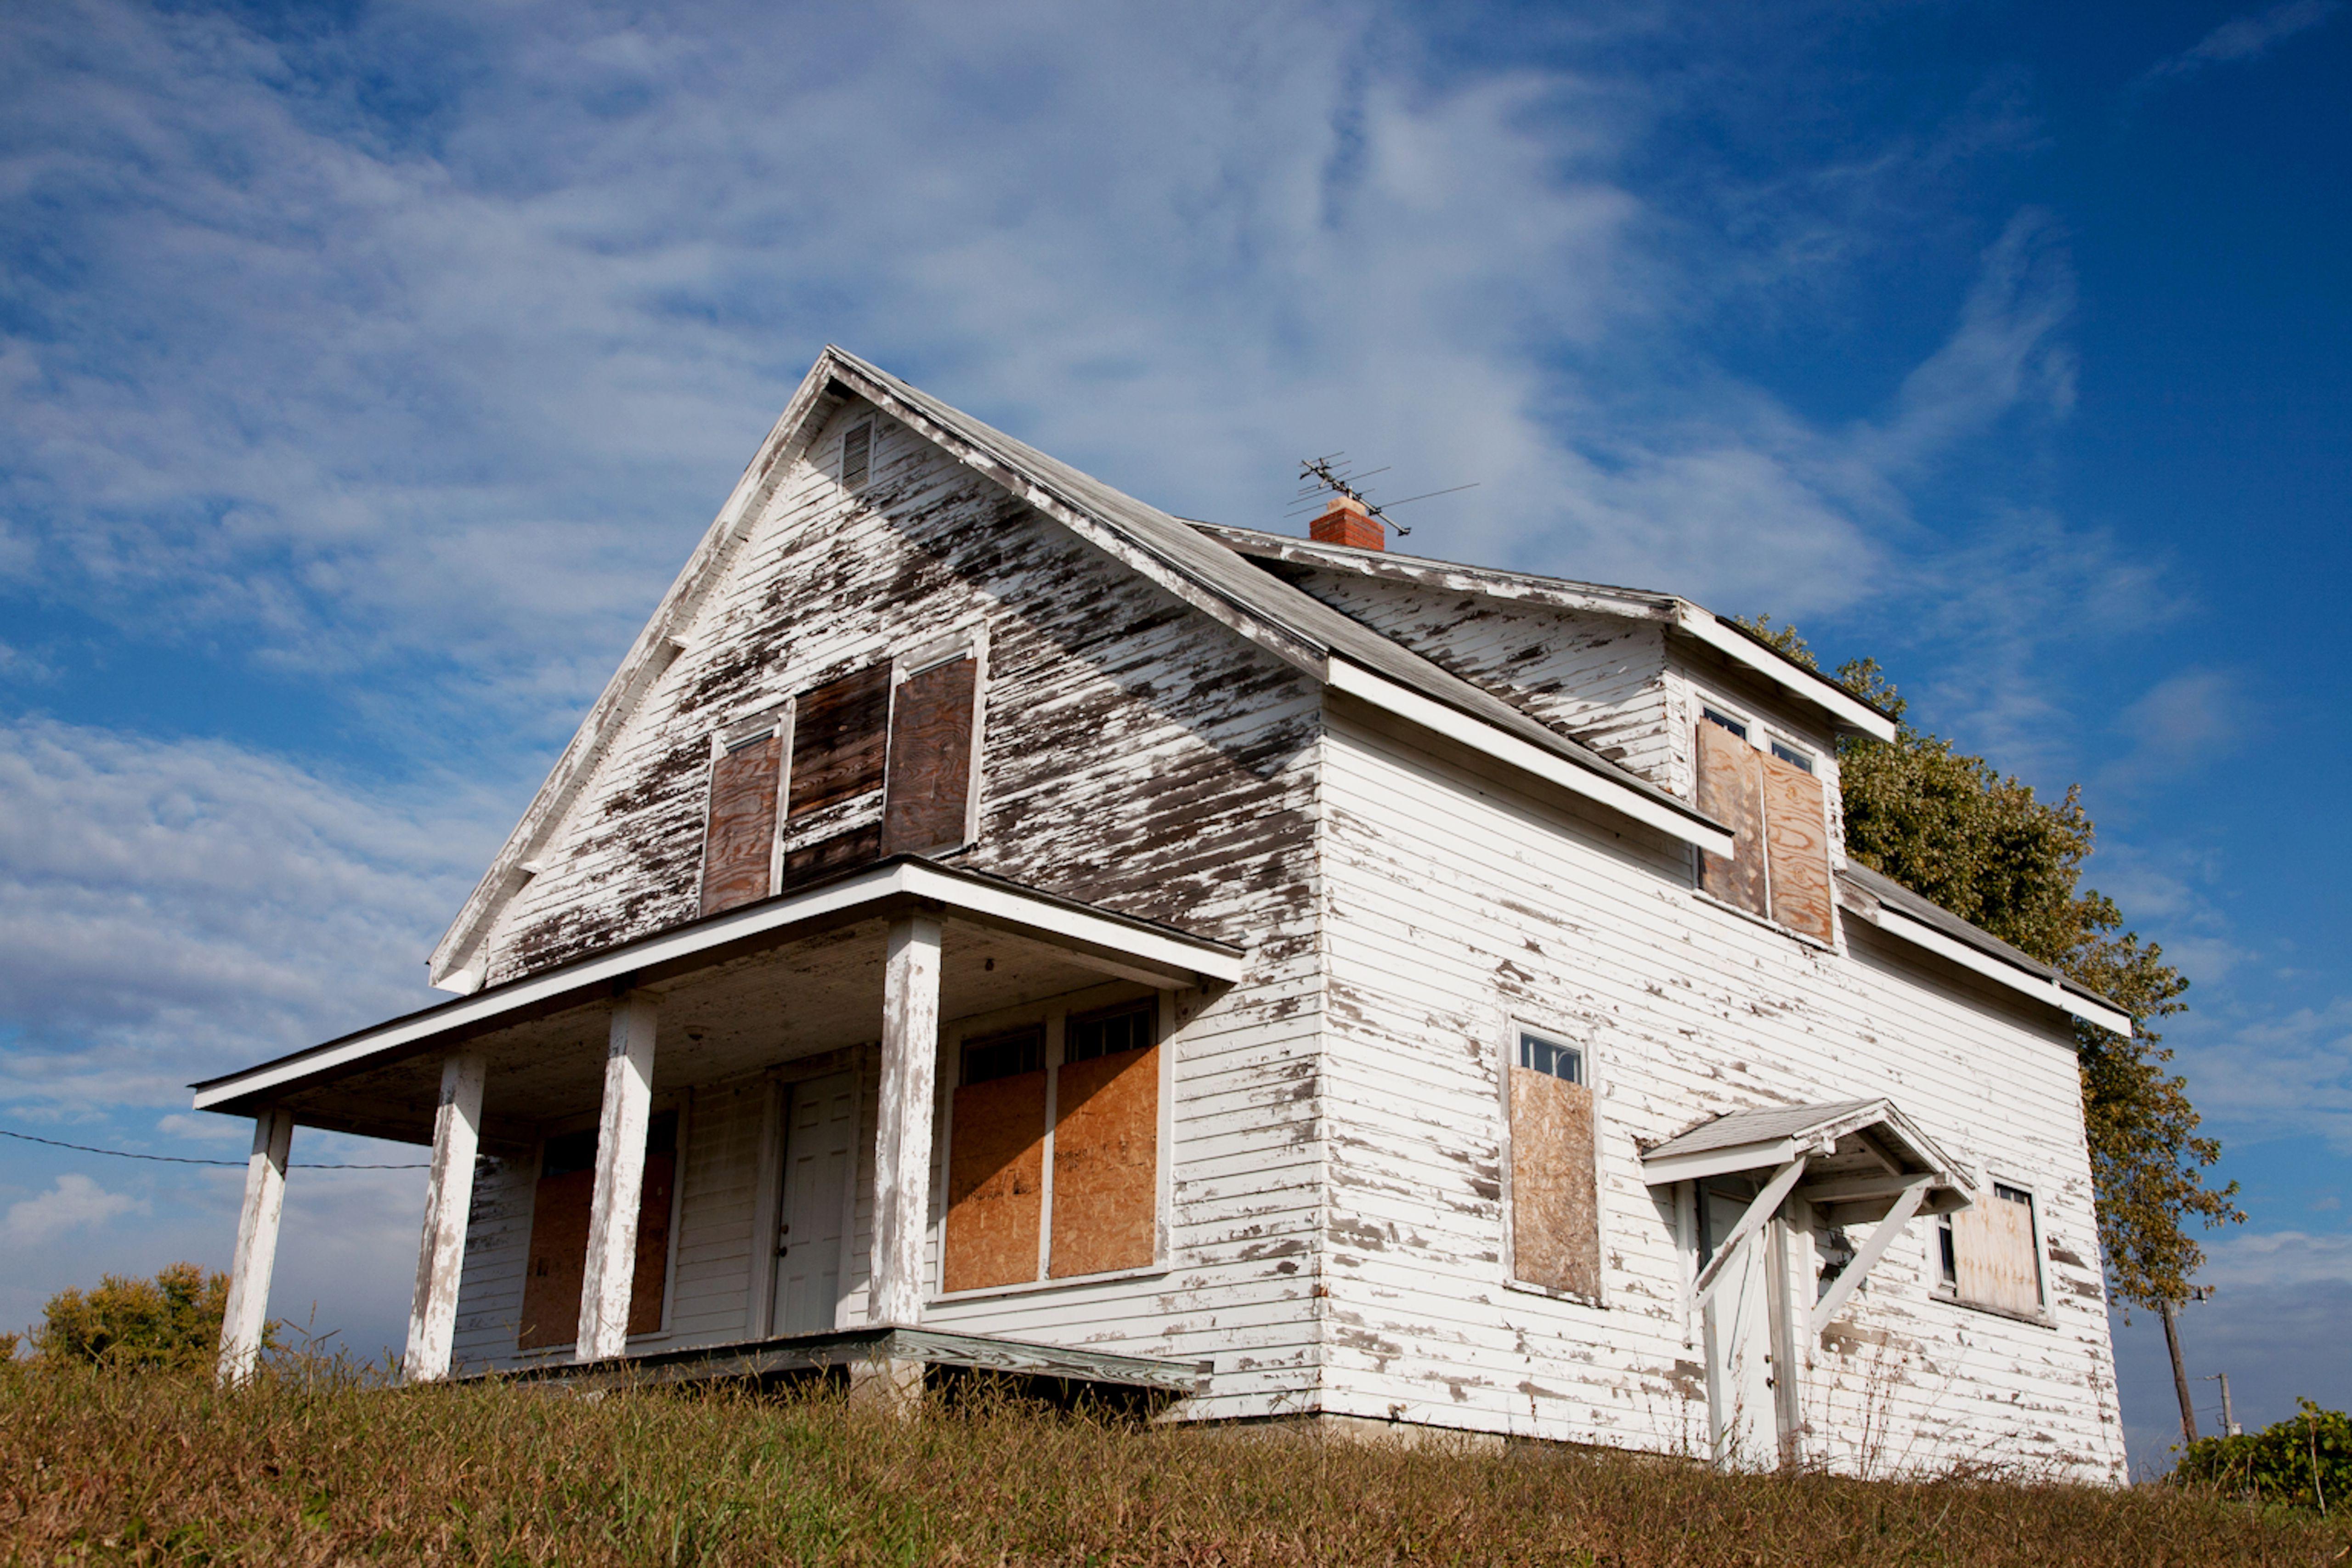 7 Steps to Fix Peeling House Paint